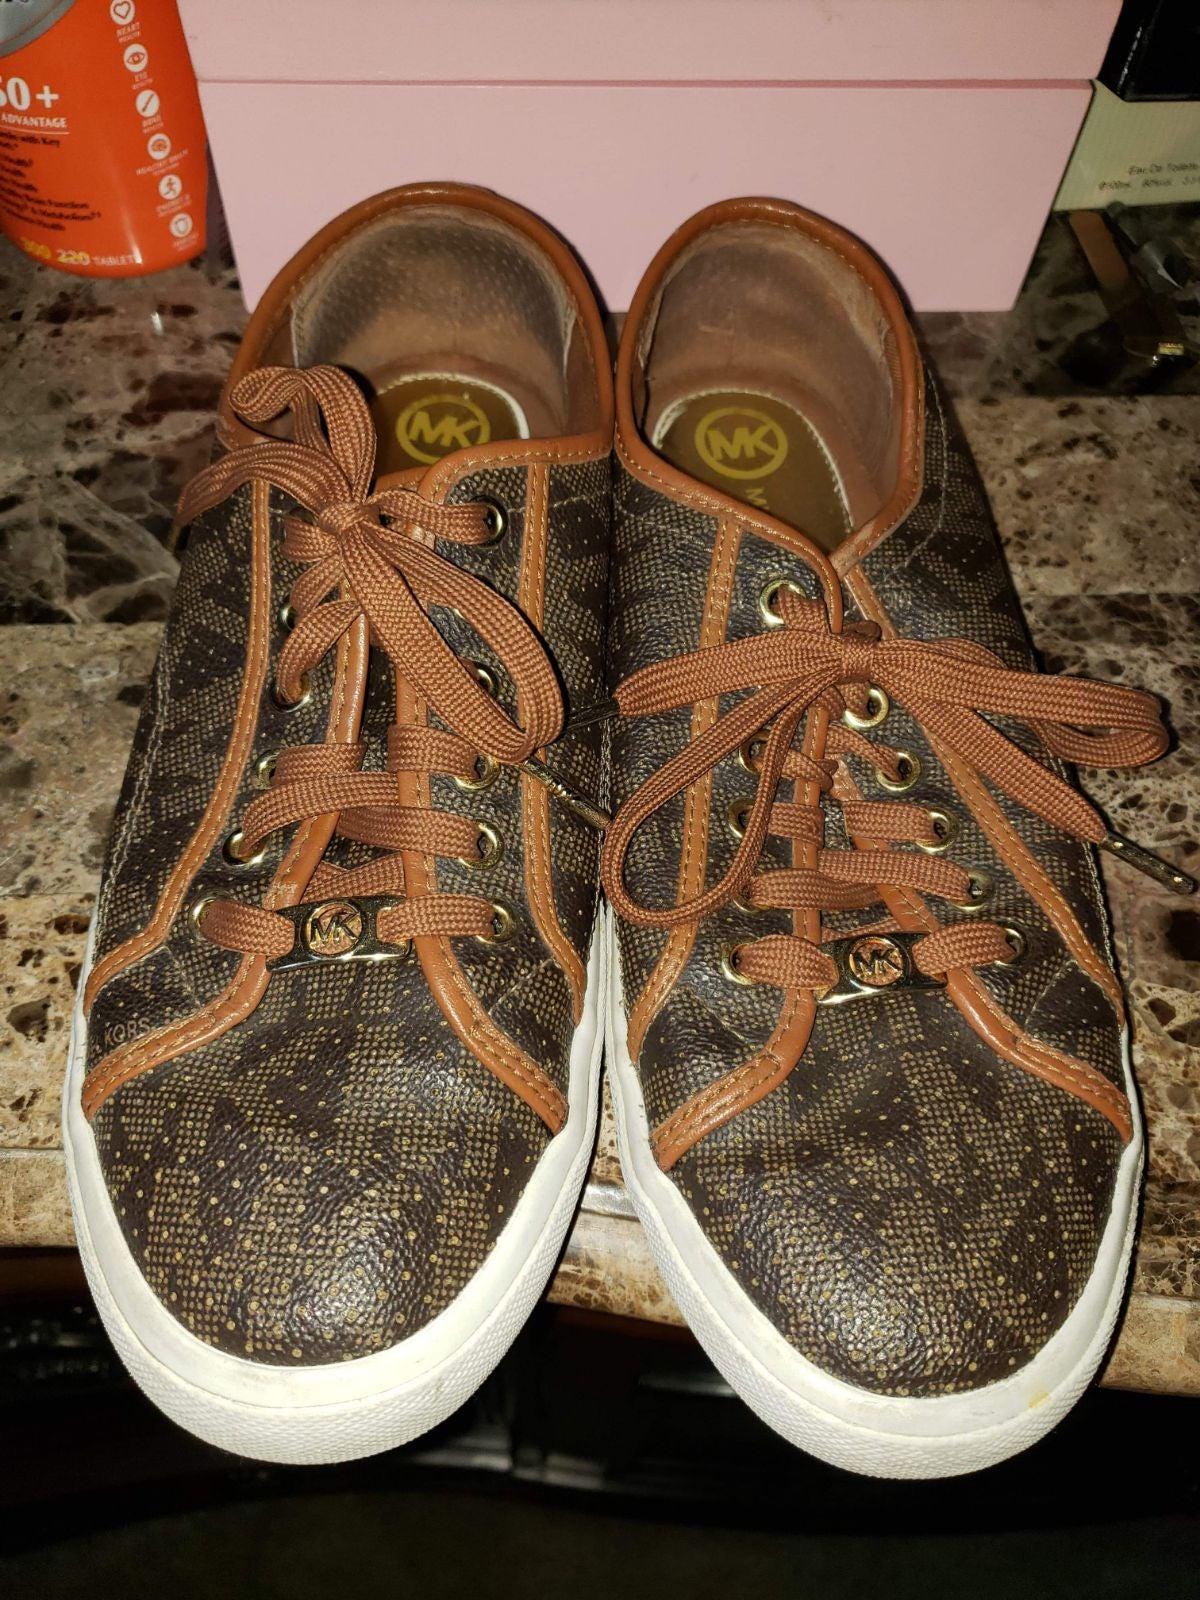 Michael Kors sneakers size 10